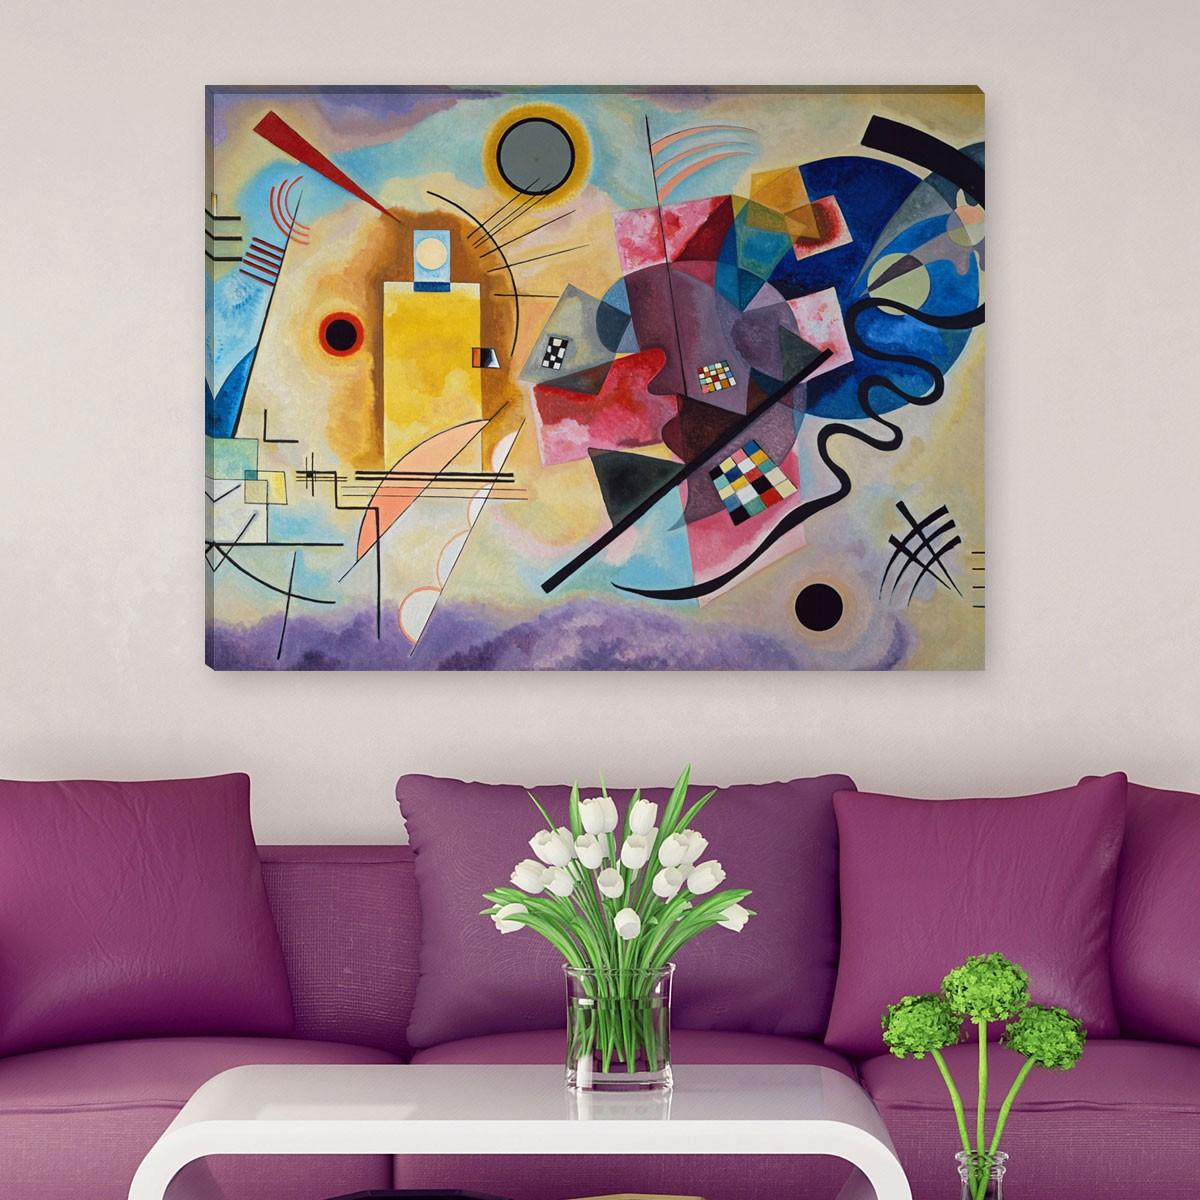 wassily kandinsky gelb rot blau. Black Bedroom Furniture Sets. Home Design Ideas